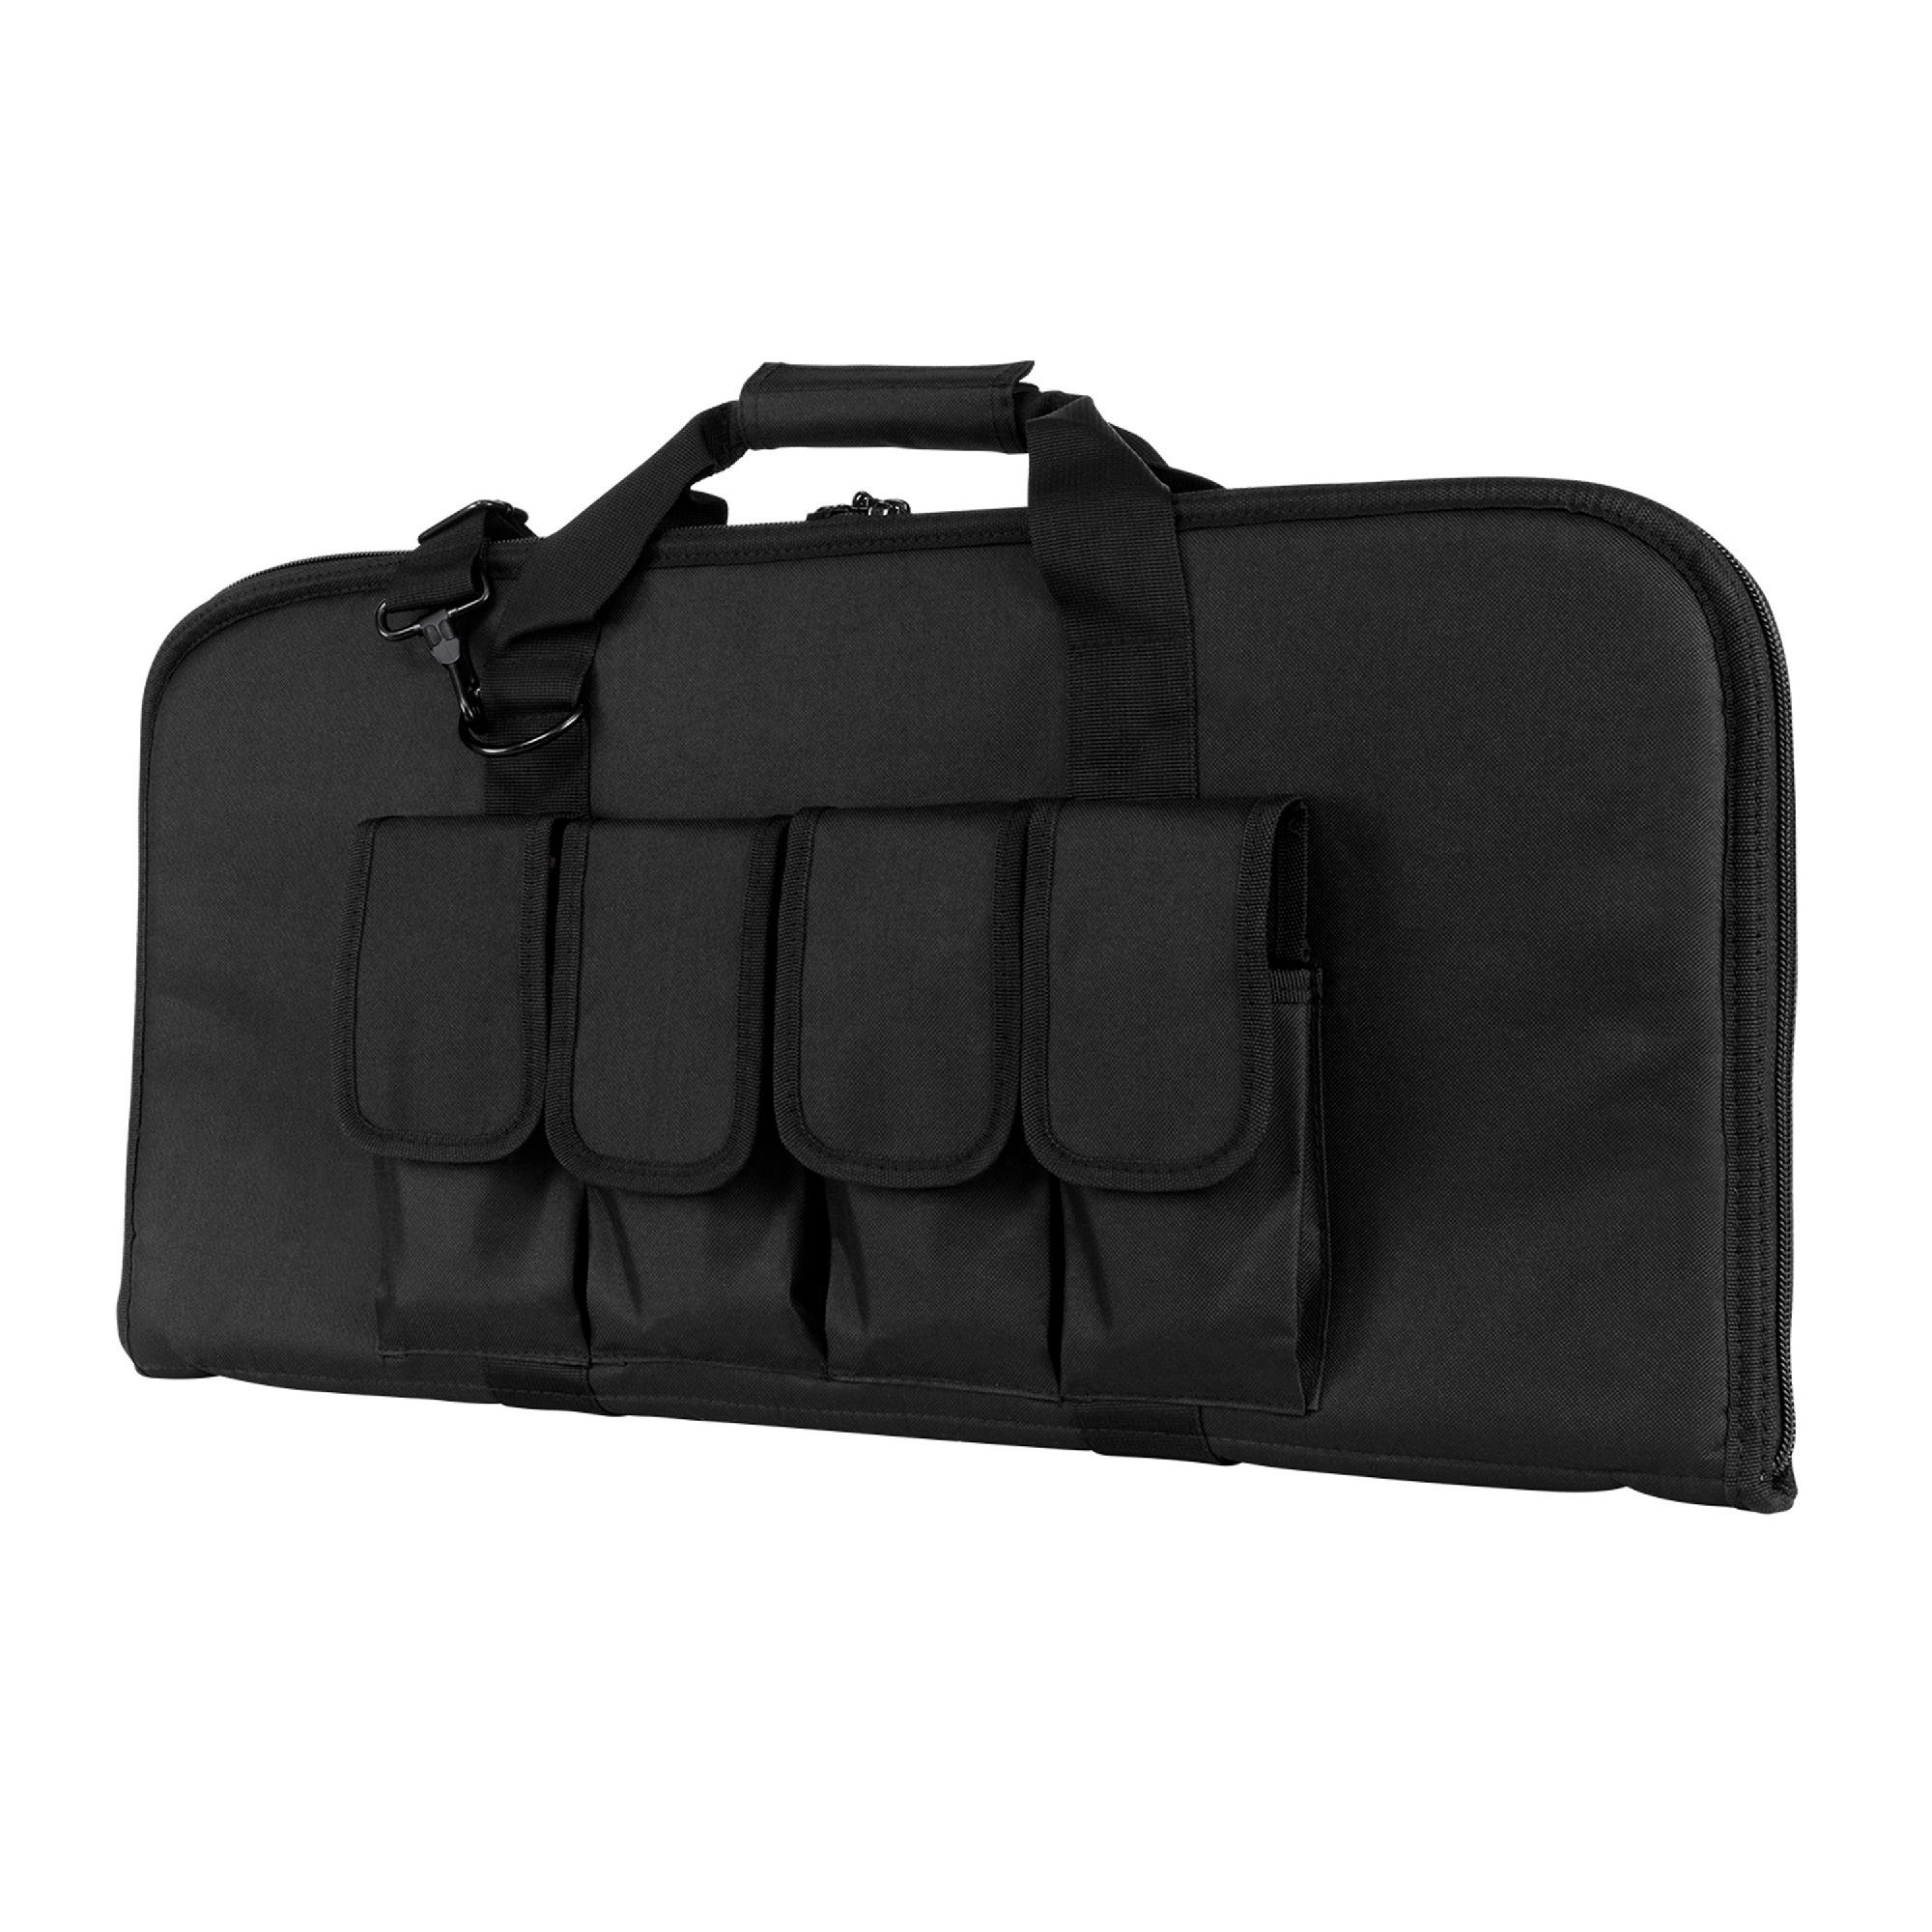 VISM by NcStar 2910 Pistol Subgun Gun Case, Black, 28'' x 13''